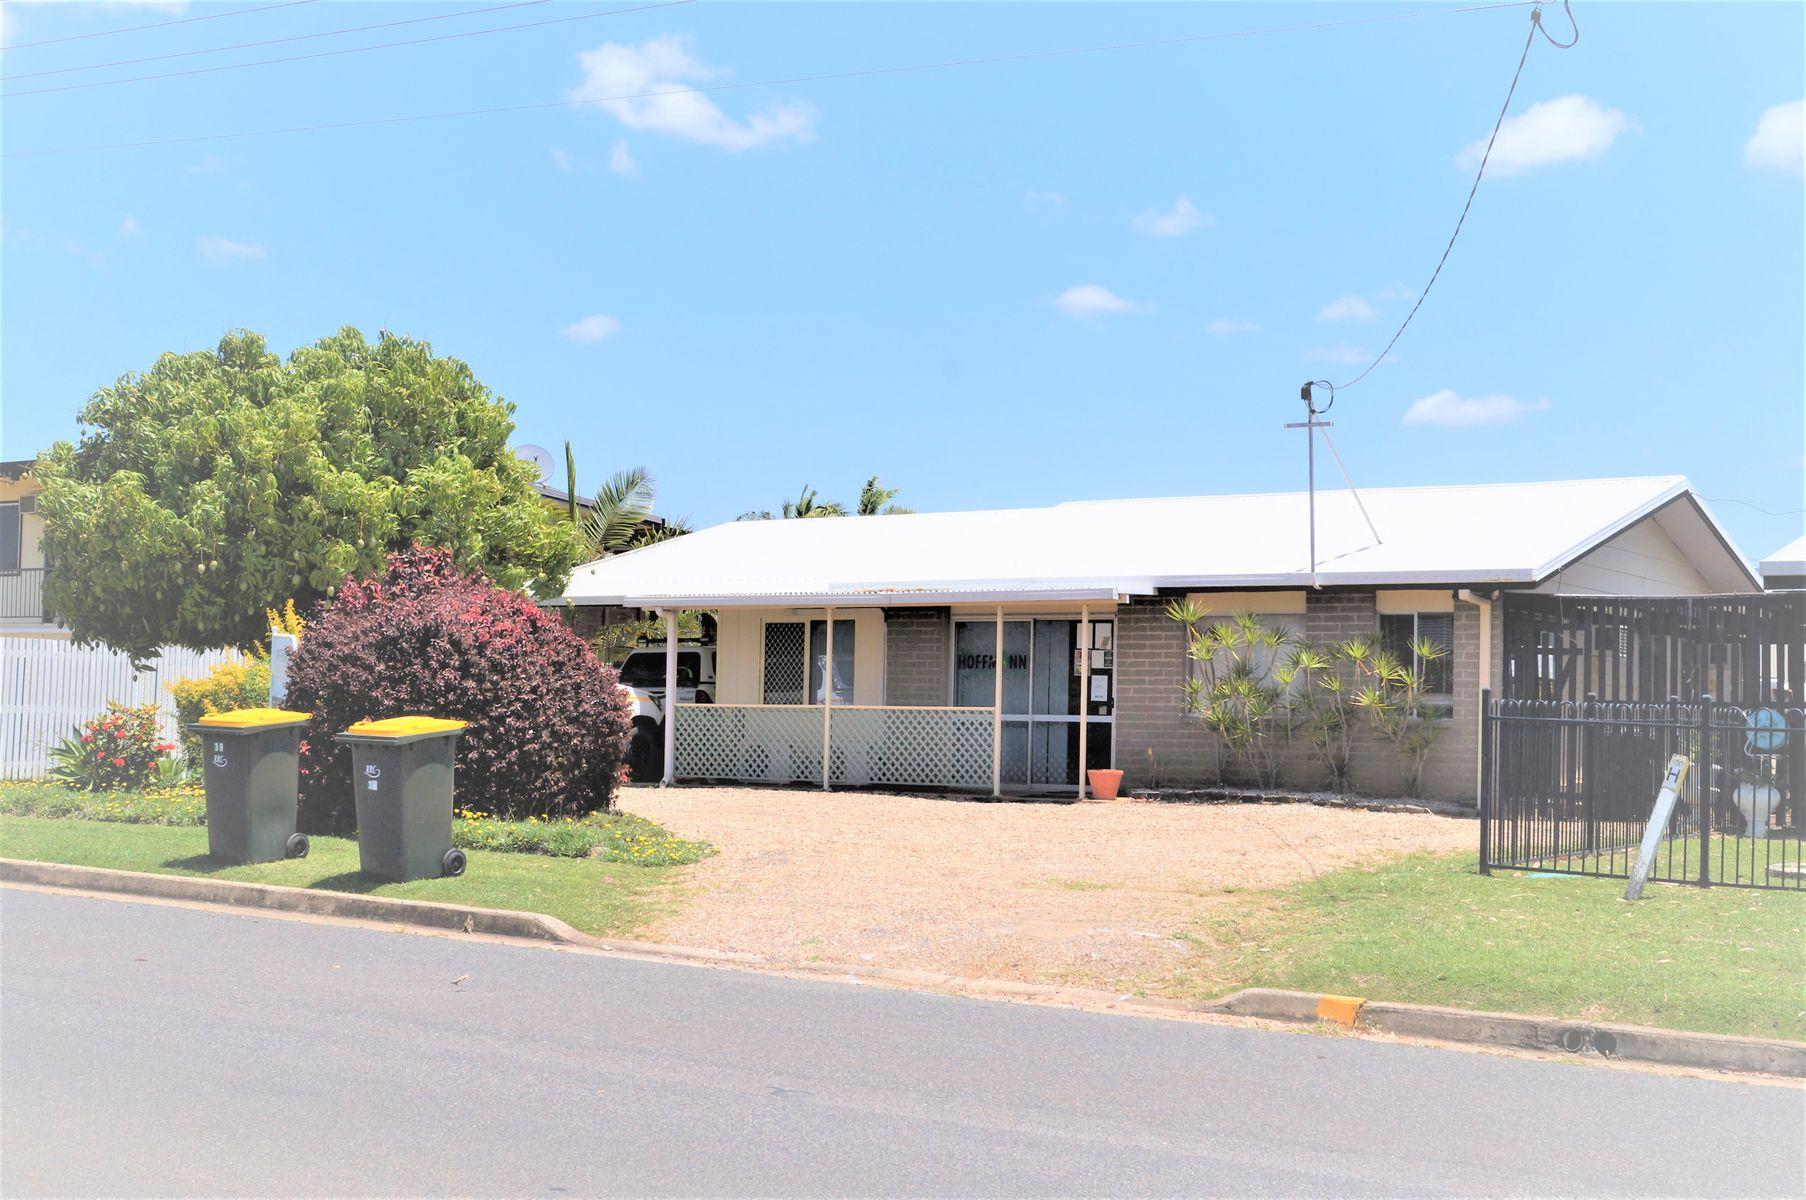 37 Withers Street, Kawana, QLD 4701